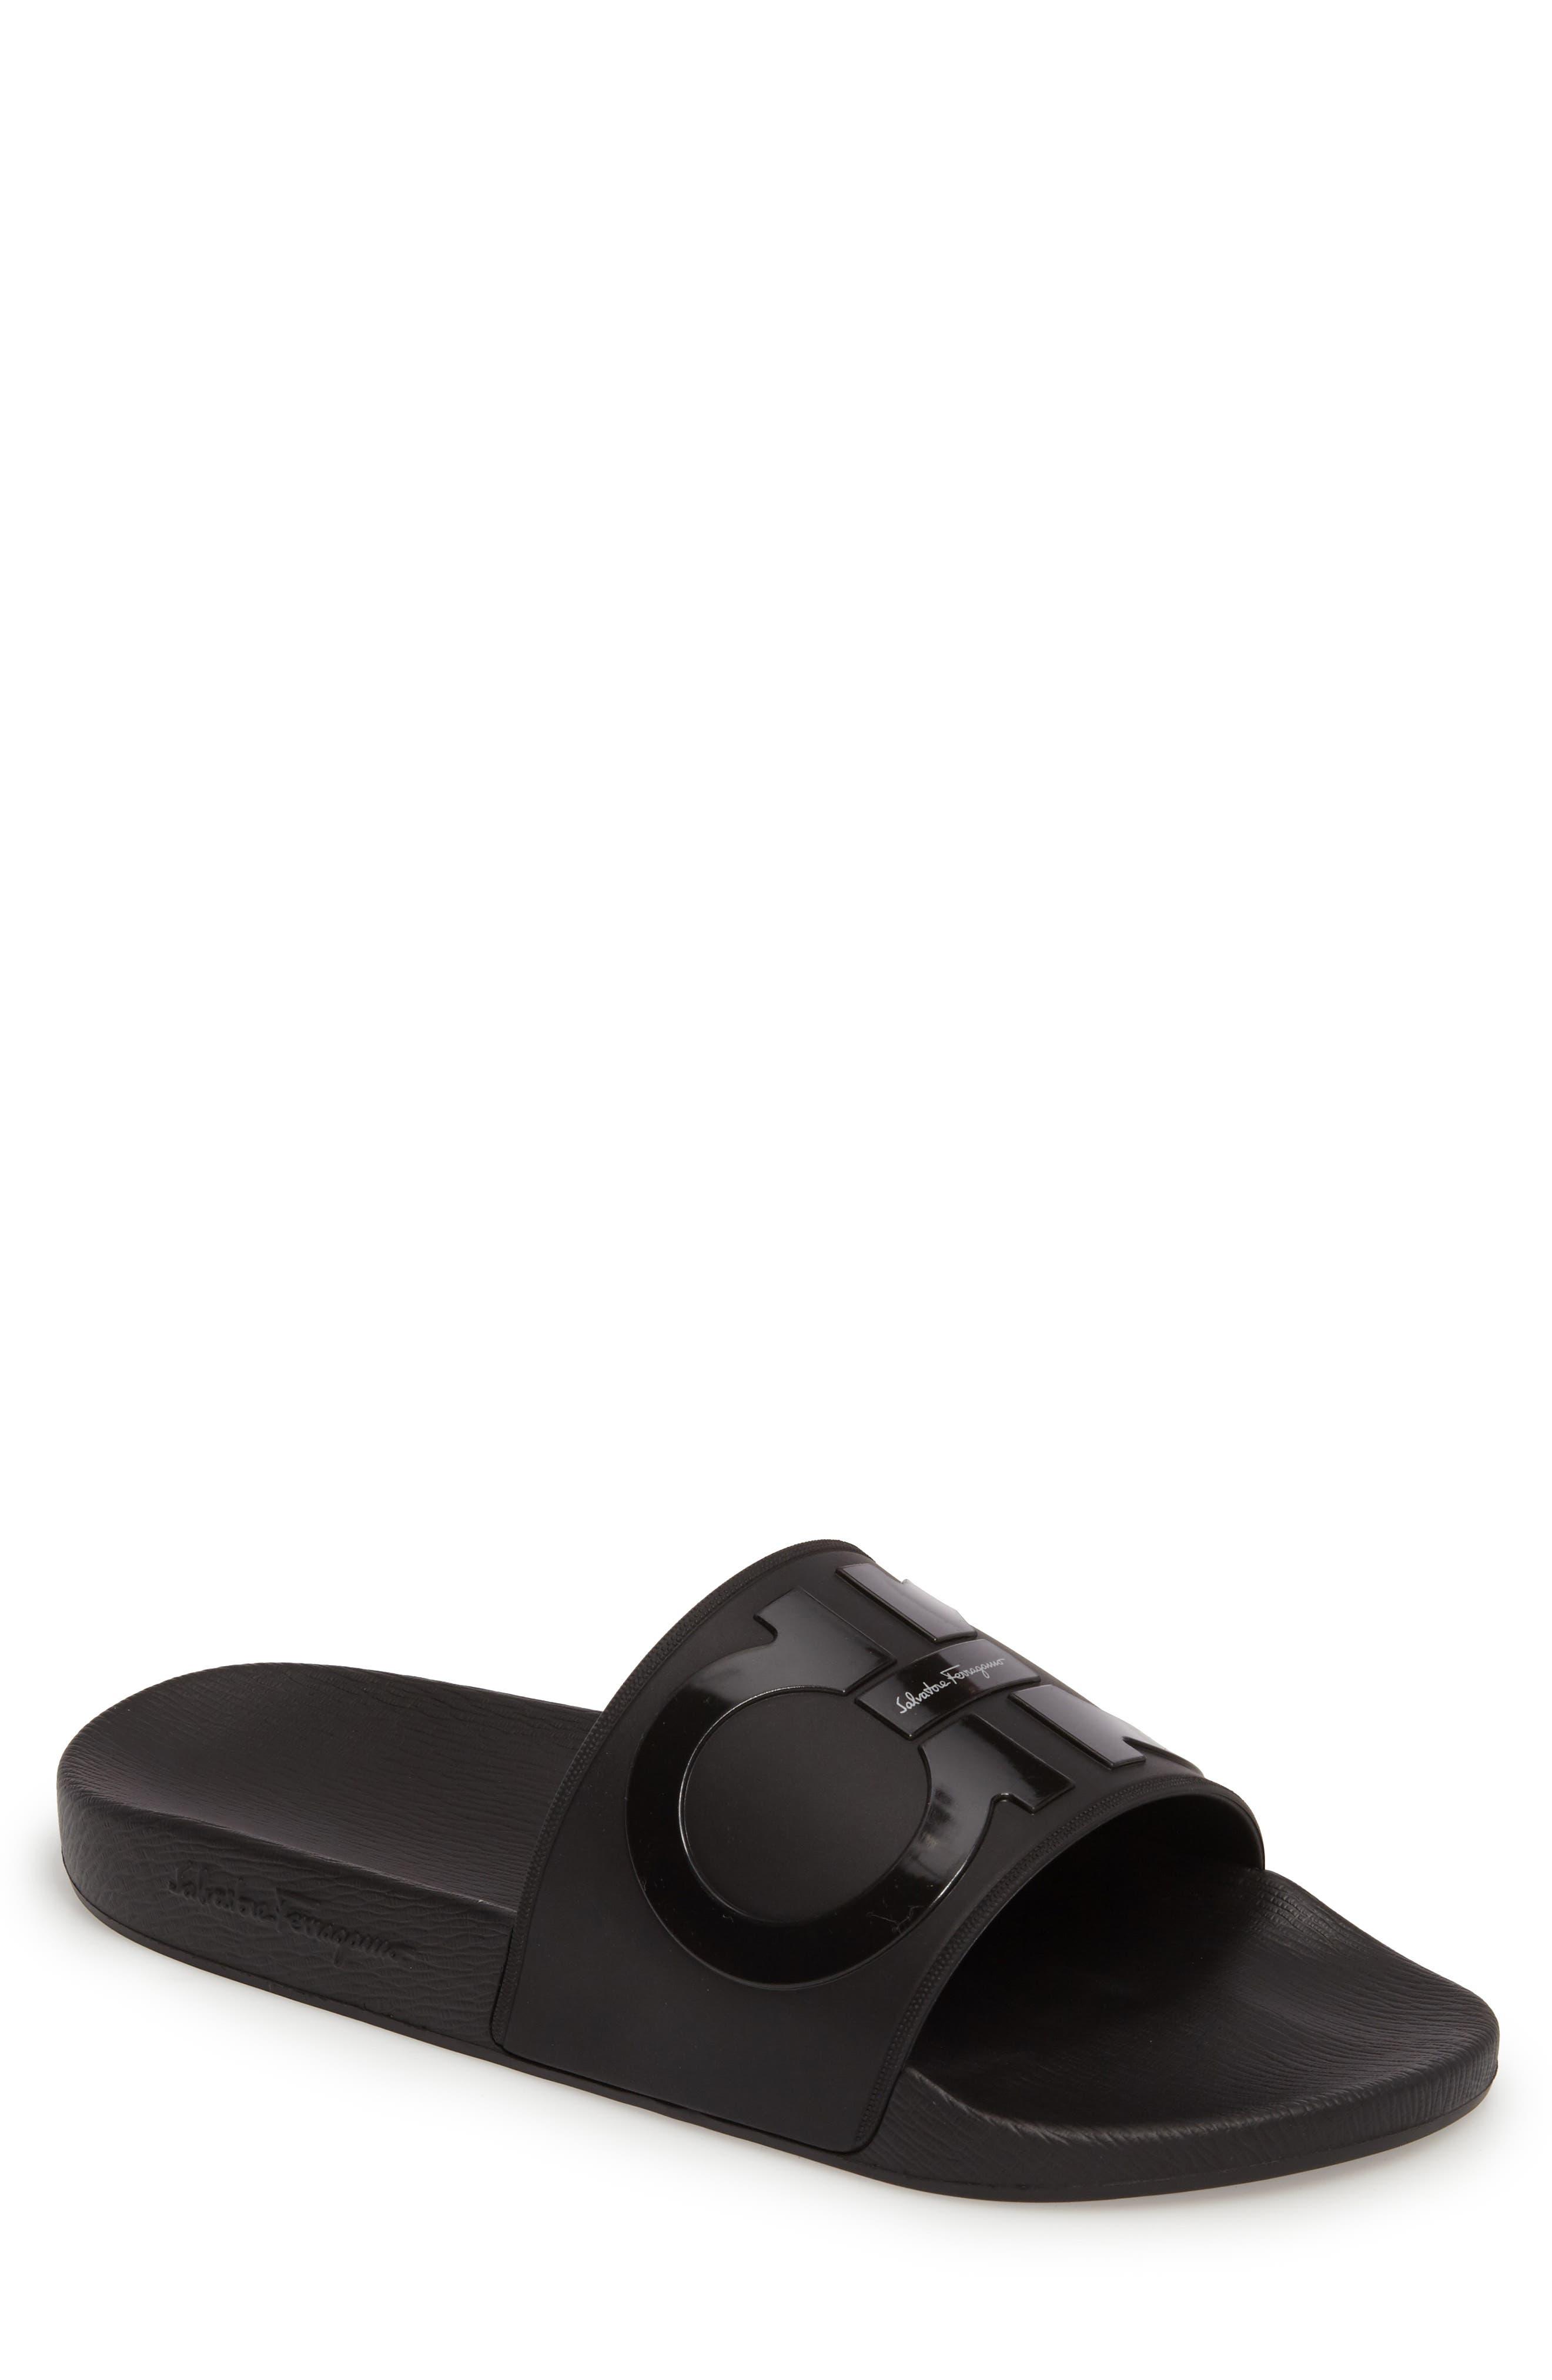 Groove 2 Slide Sandal,                         Main,                         color, NERO/ NERO